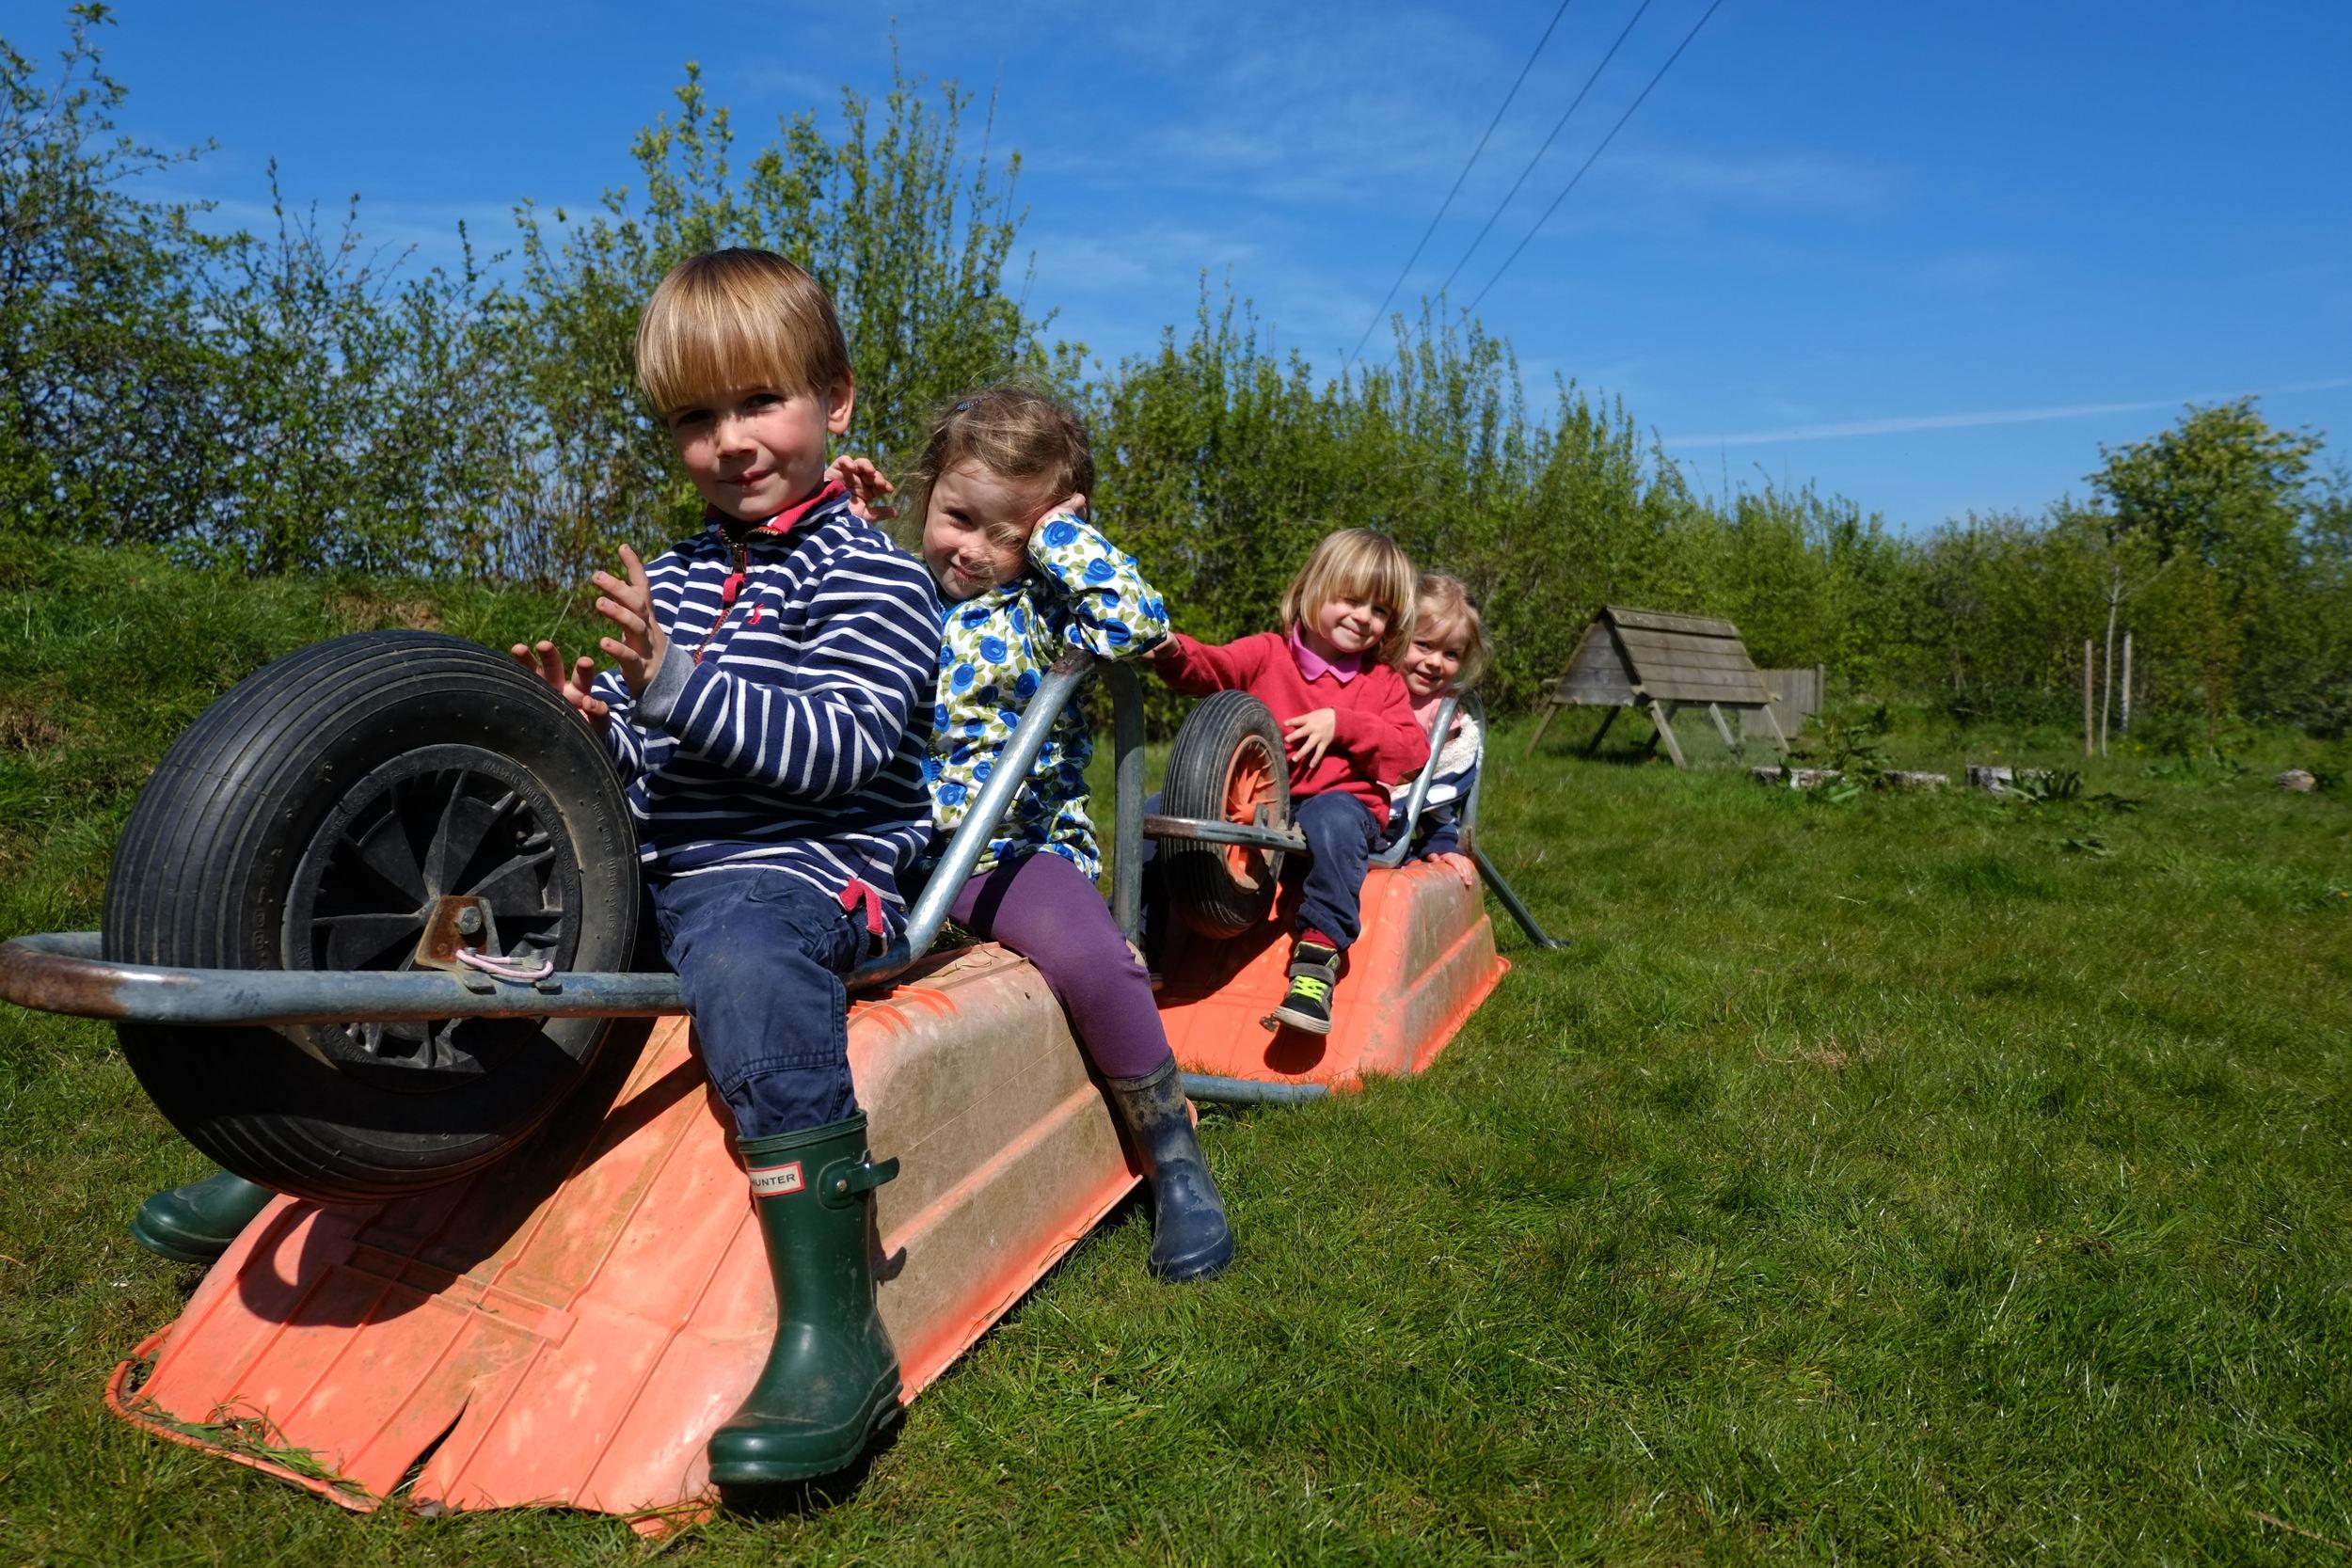 Kids sitting on a pair of wheelbarrows